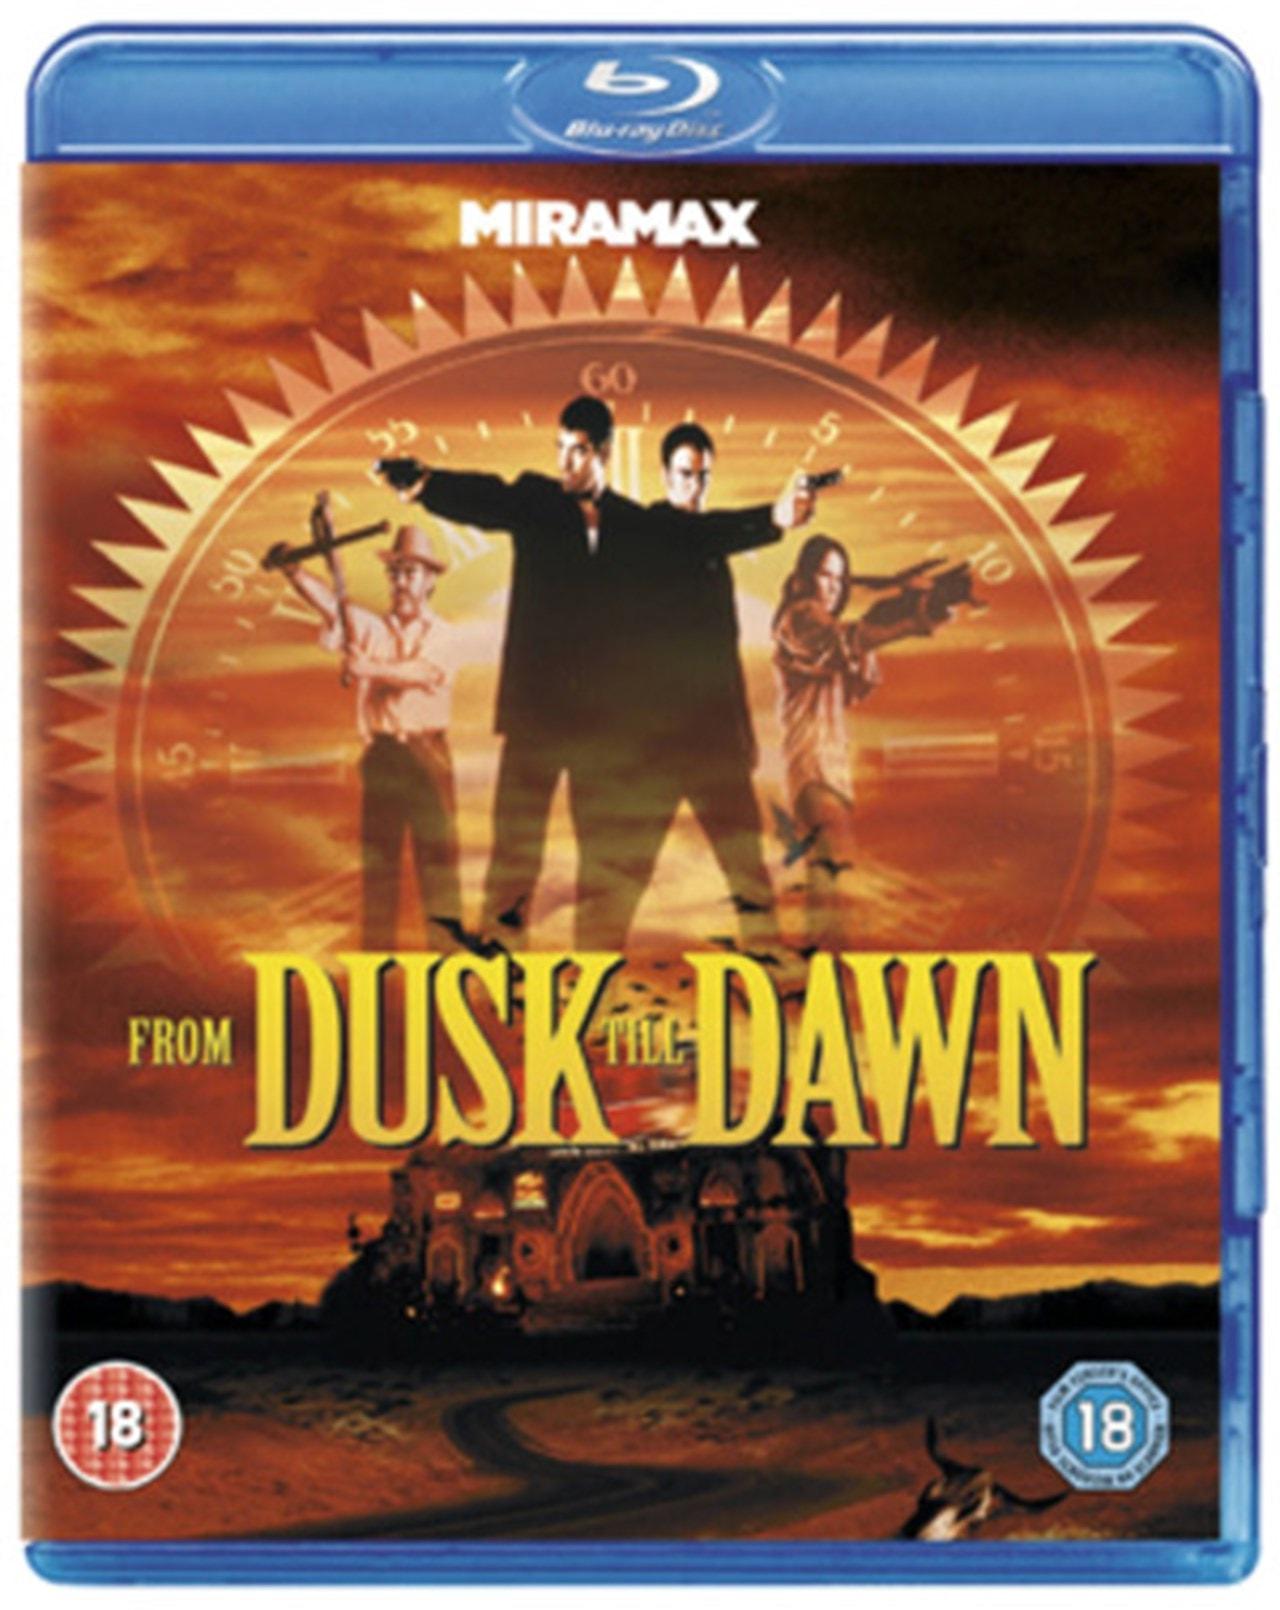 From Dusk Till Dawn - 1